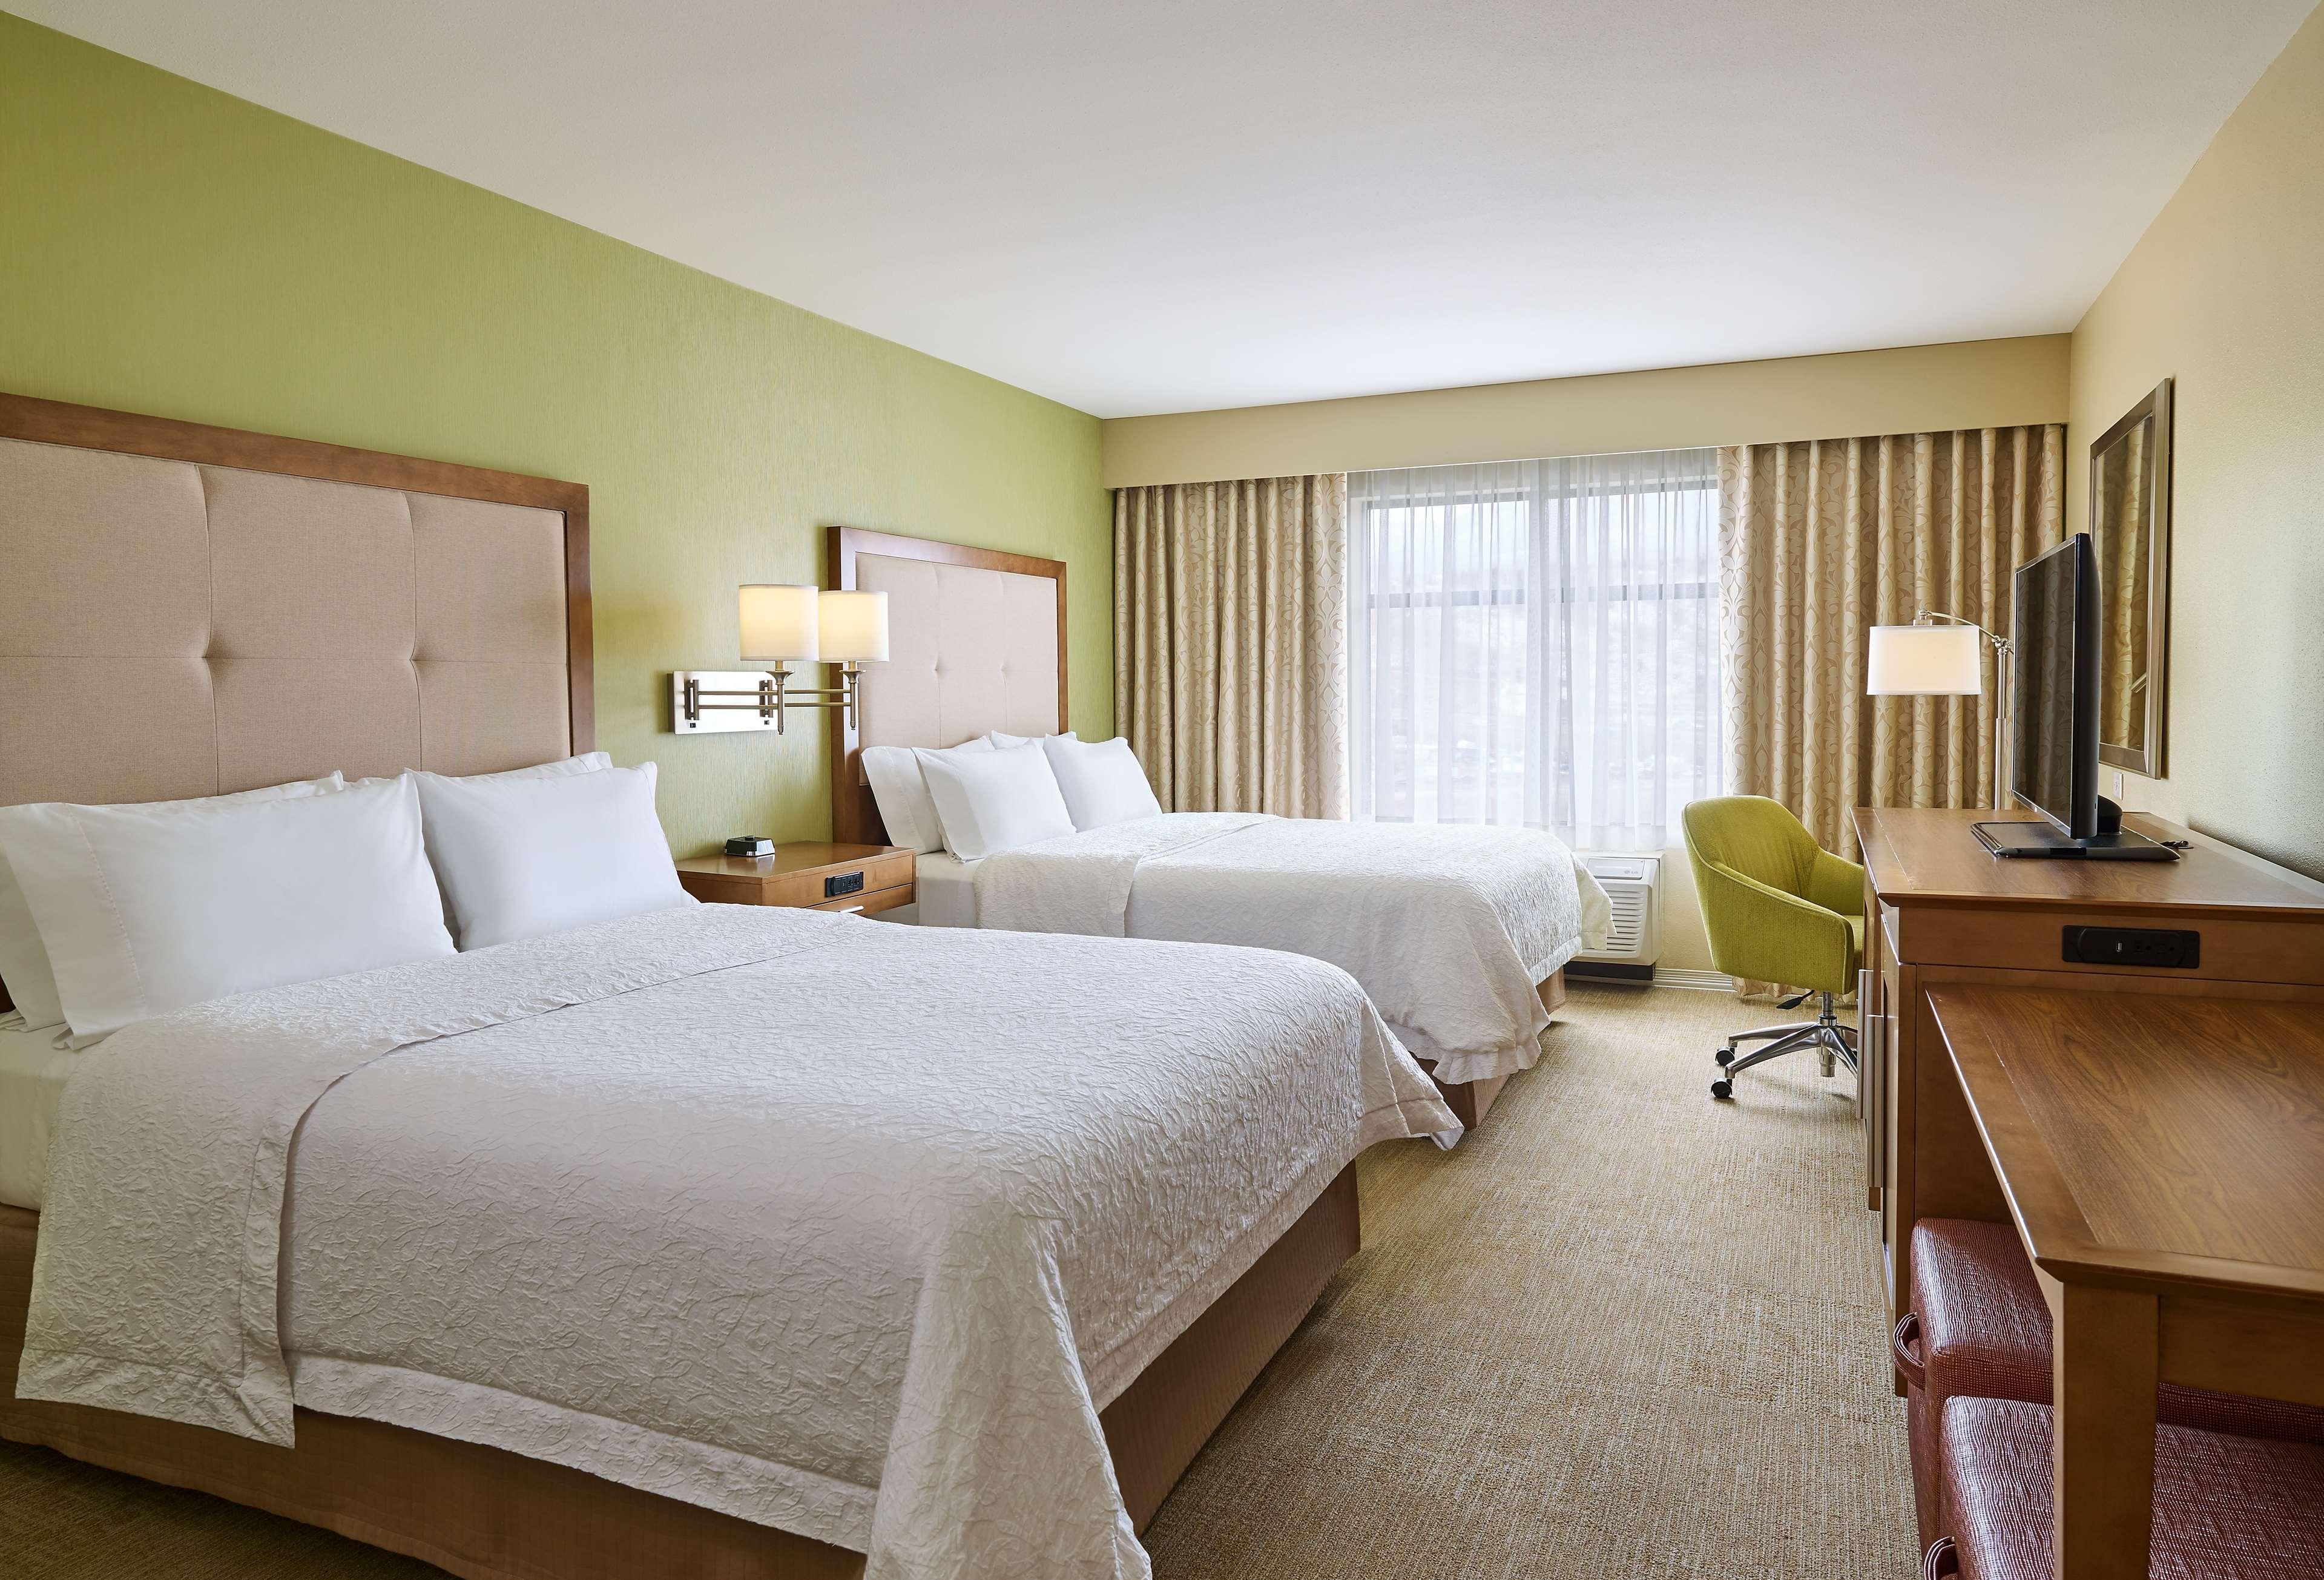 Hampton Inn & Suites Silverthorne image 30